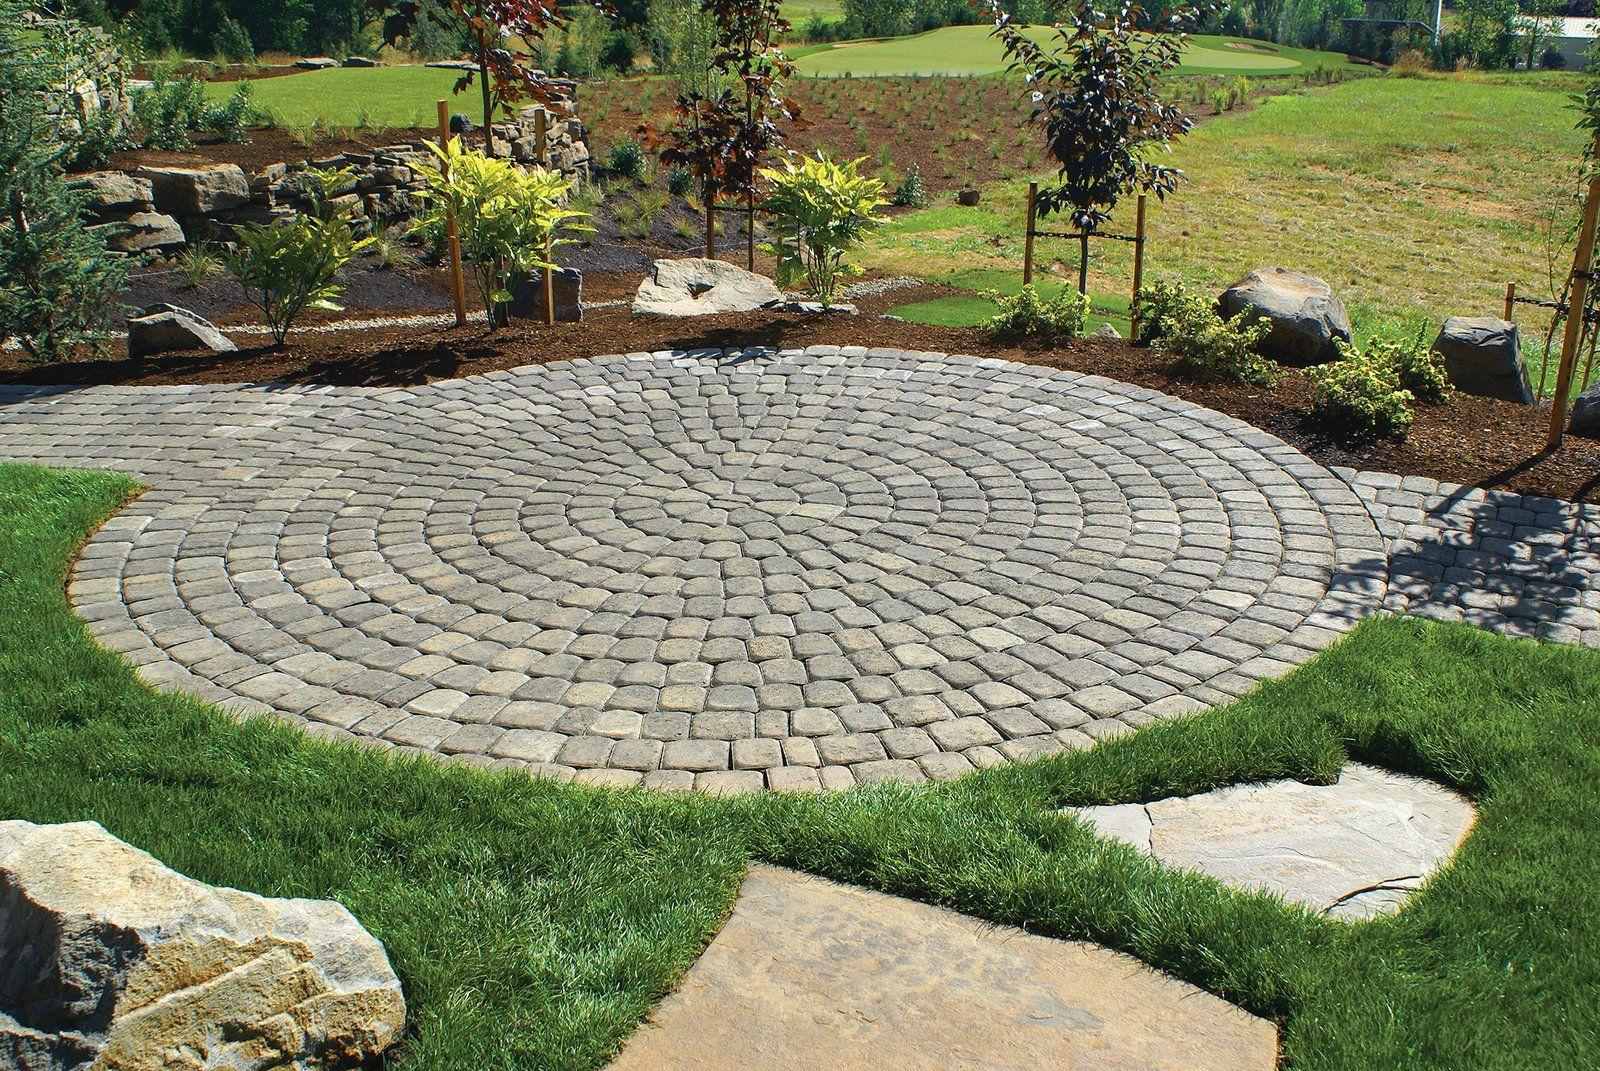 Old Dominion Circle Kit 39 27 Sq Ft Patio Pavers Design Circular Patio Backyard Landscaping